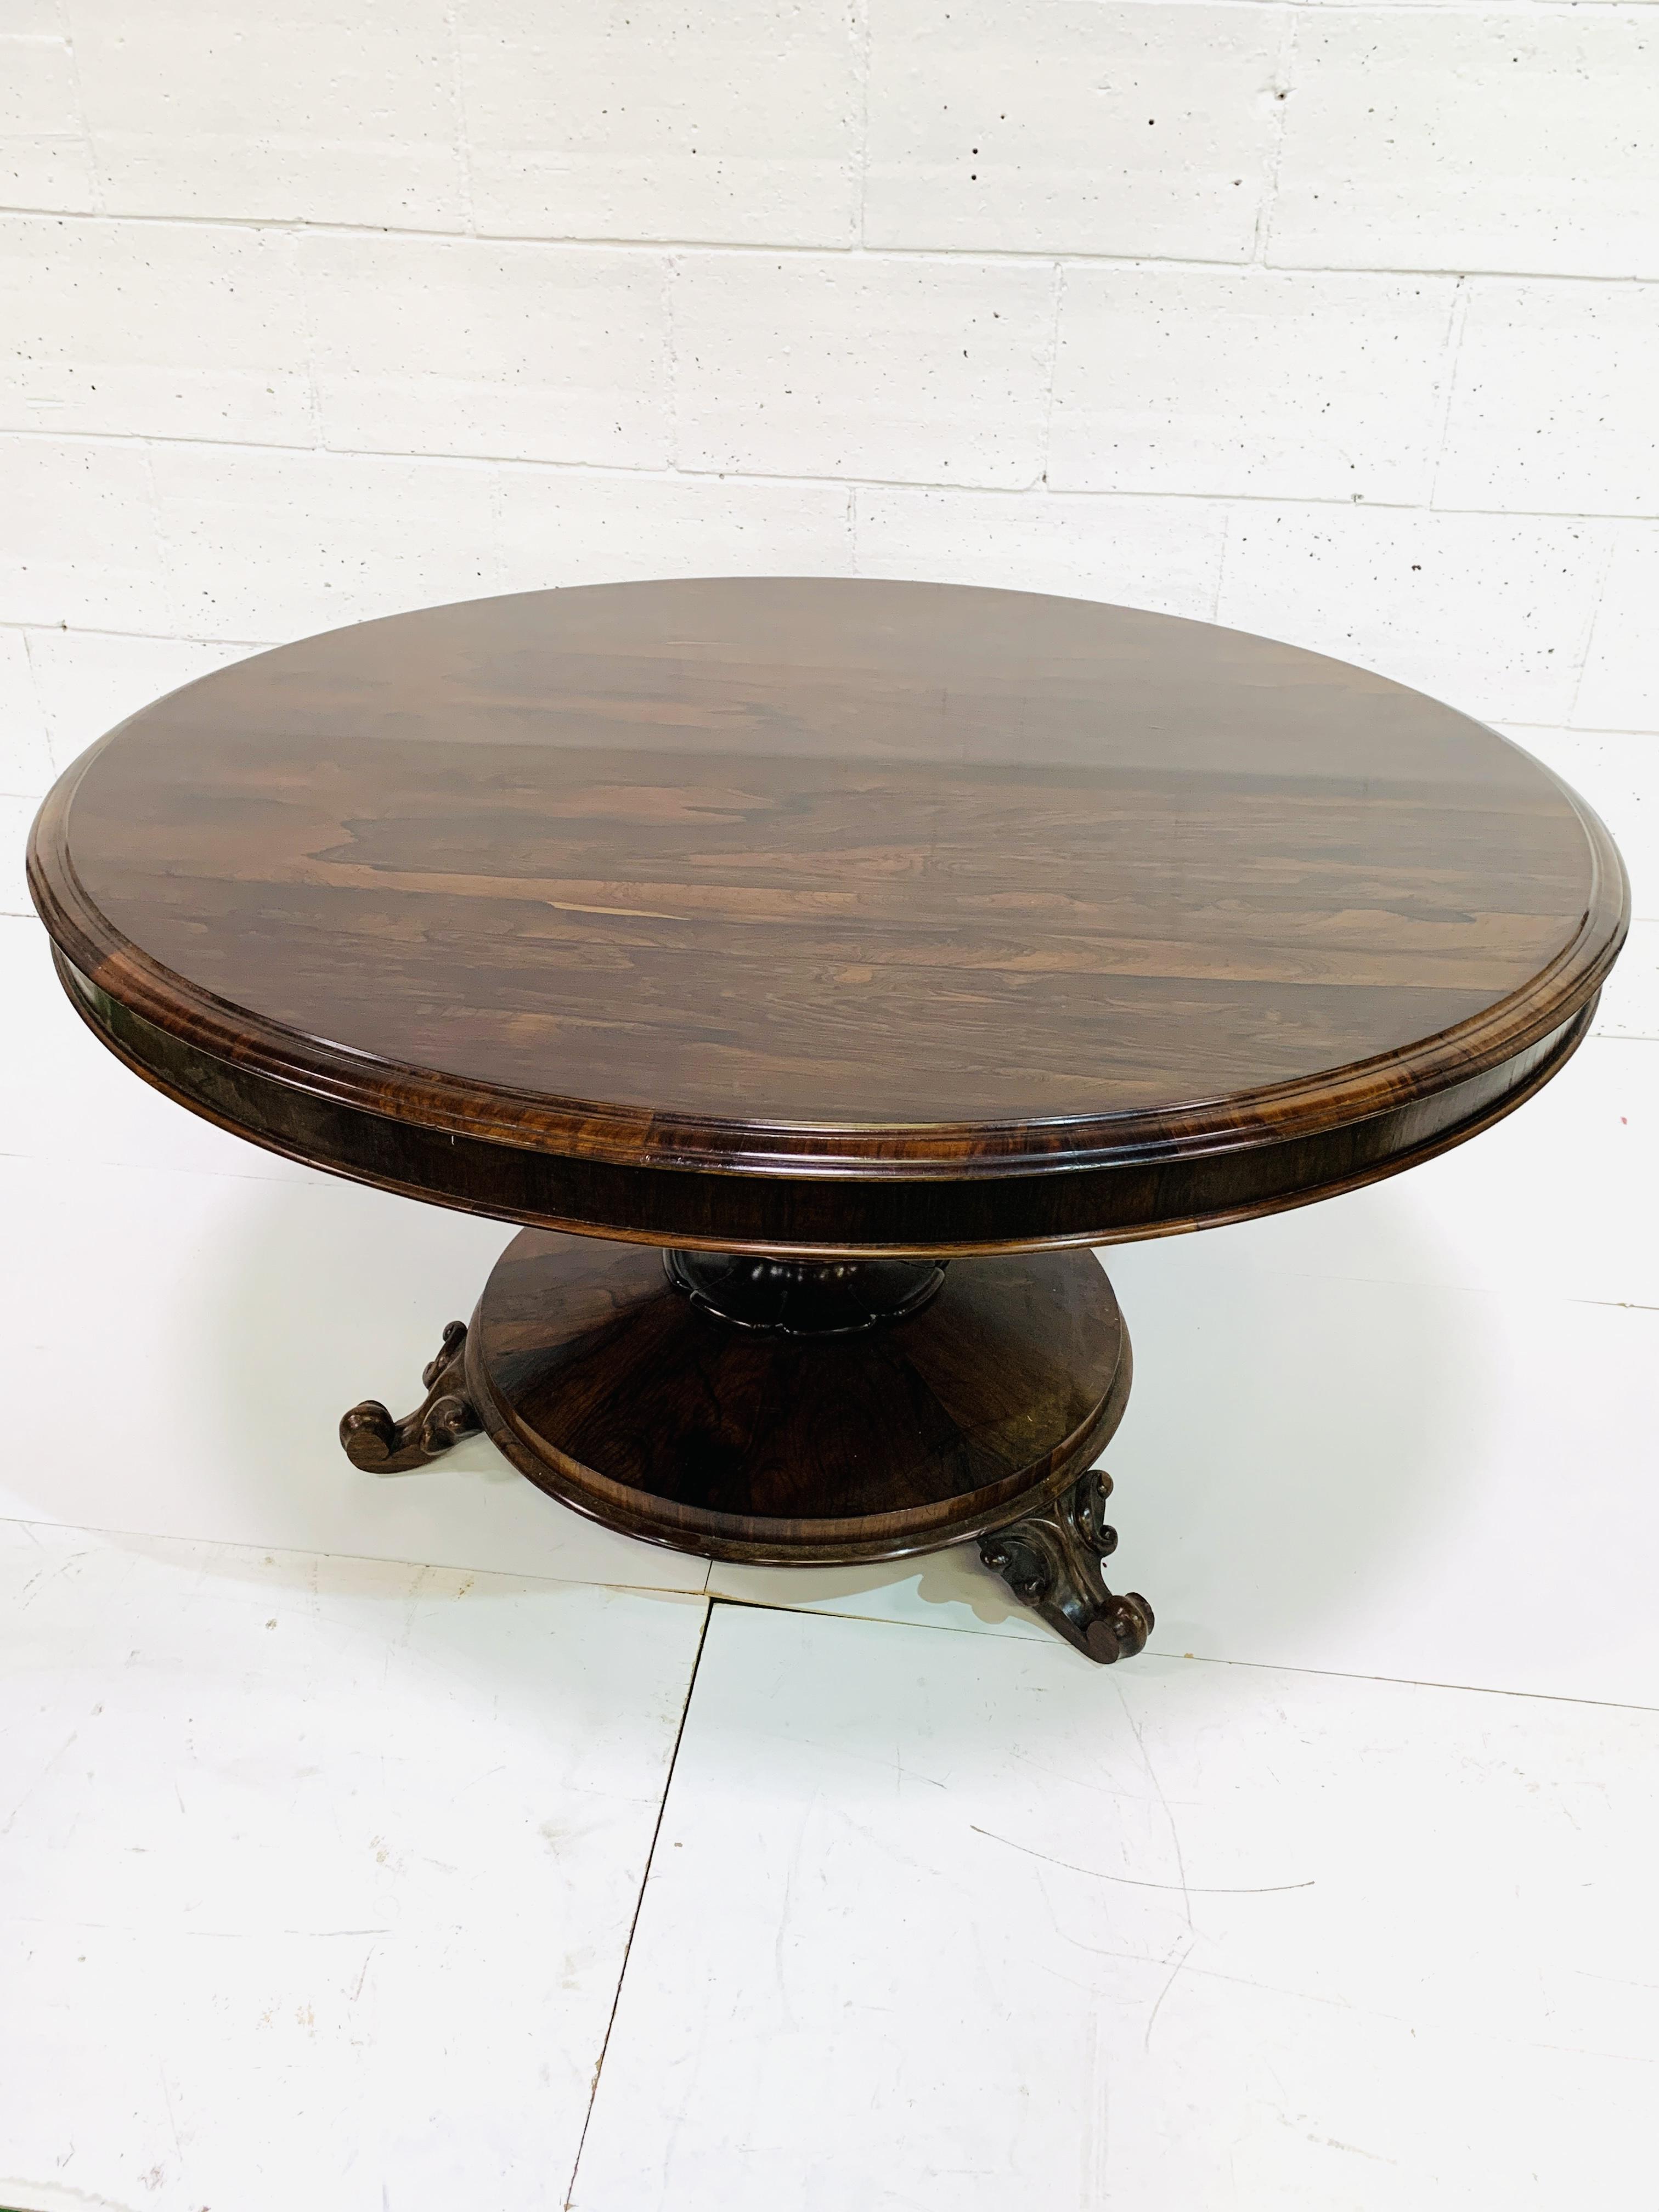 Victorian circular Rosewood tilt top table - Image 7 of 9